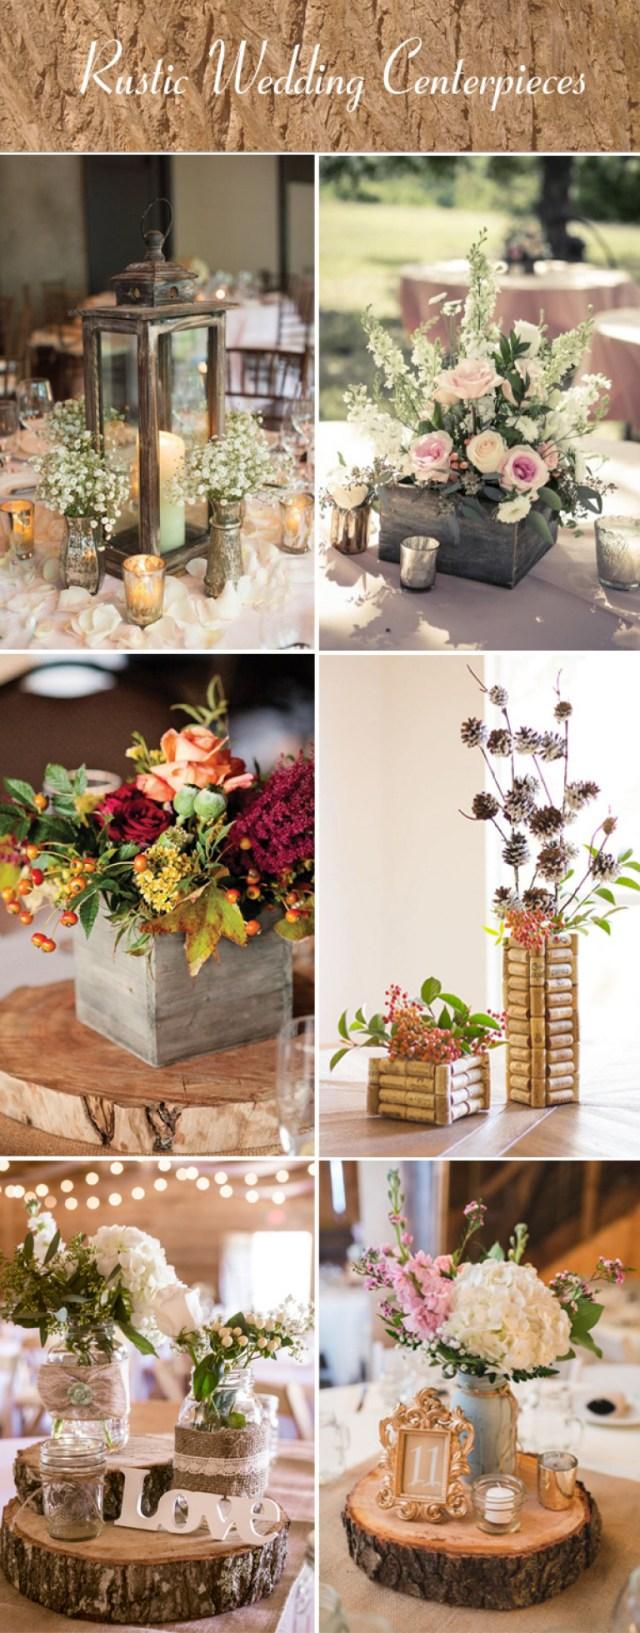 Fun Wedding Decor Wedding Table Decor Ideas Macycling